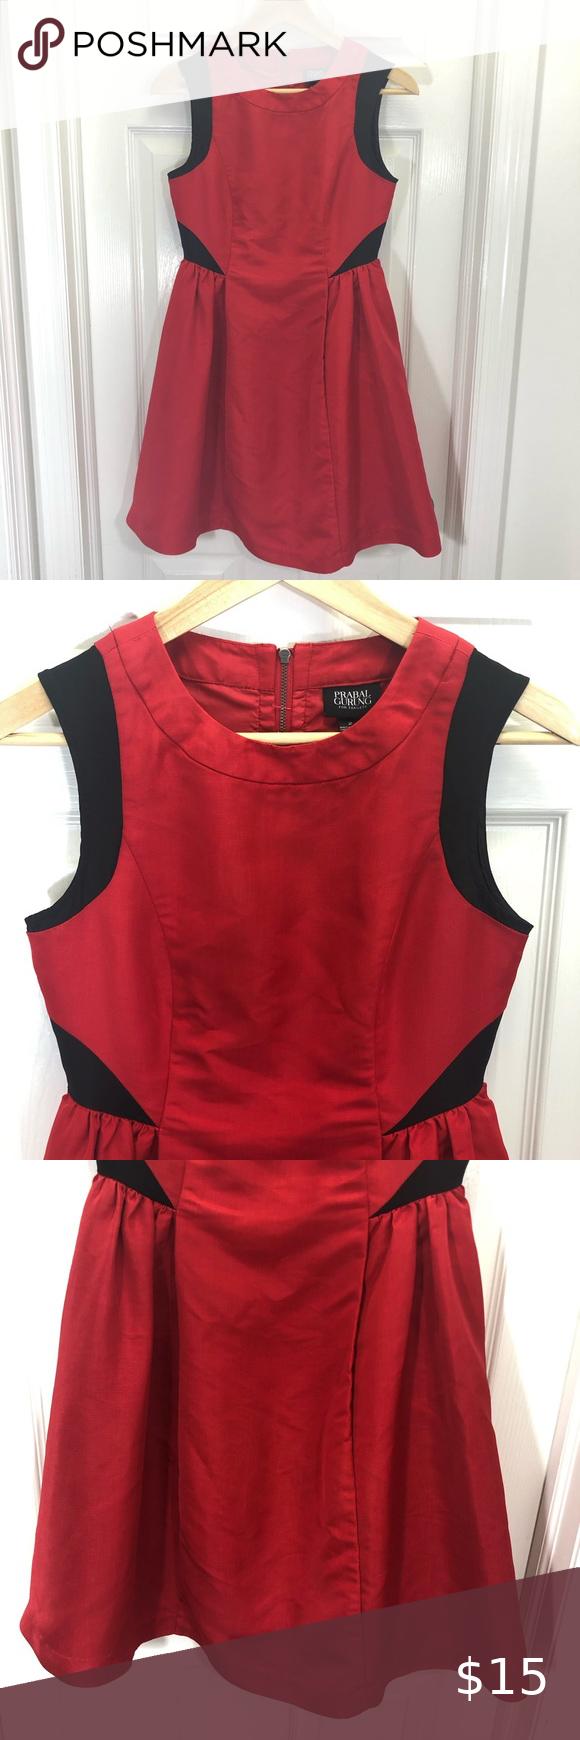 4 25 Prabal Gurung For Target Fit Flare Dress Fit Flare Dress Flare Dress Fit Flare [ 1740 x 580 Pixel ]